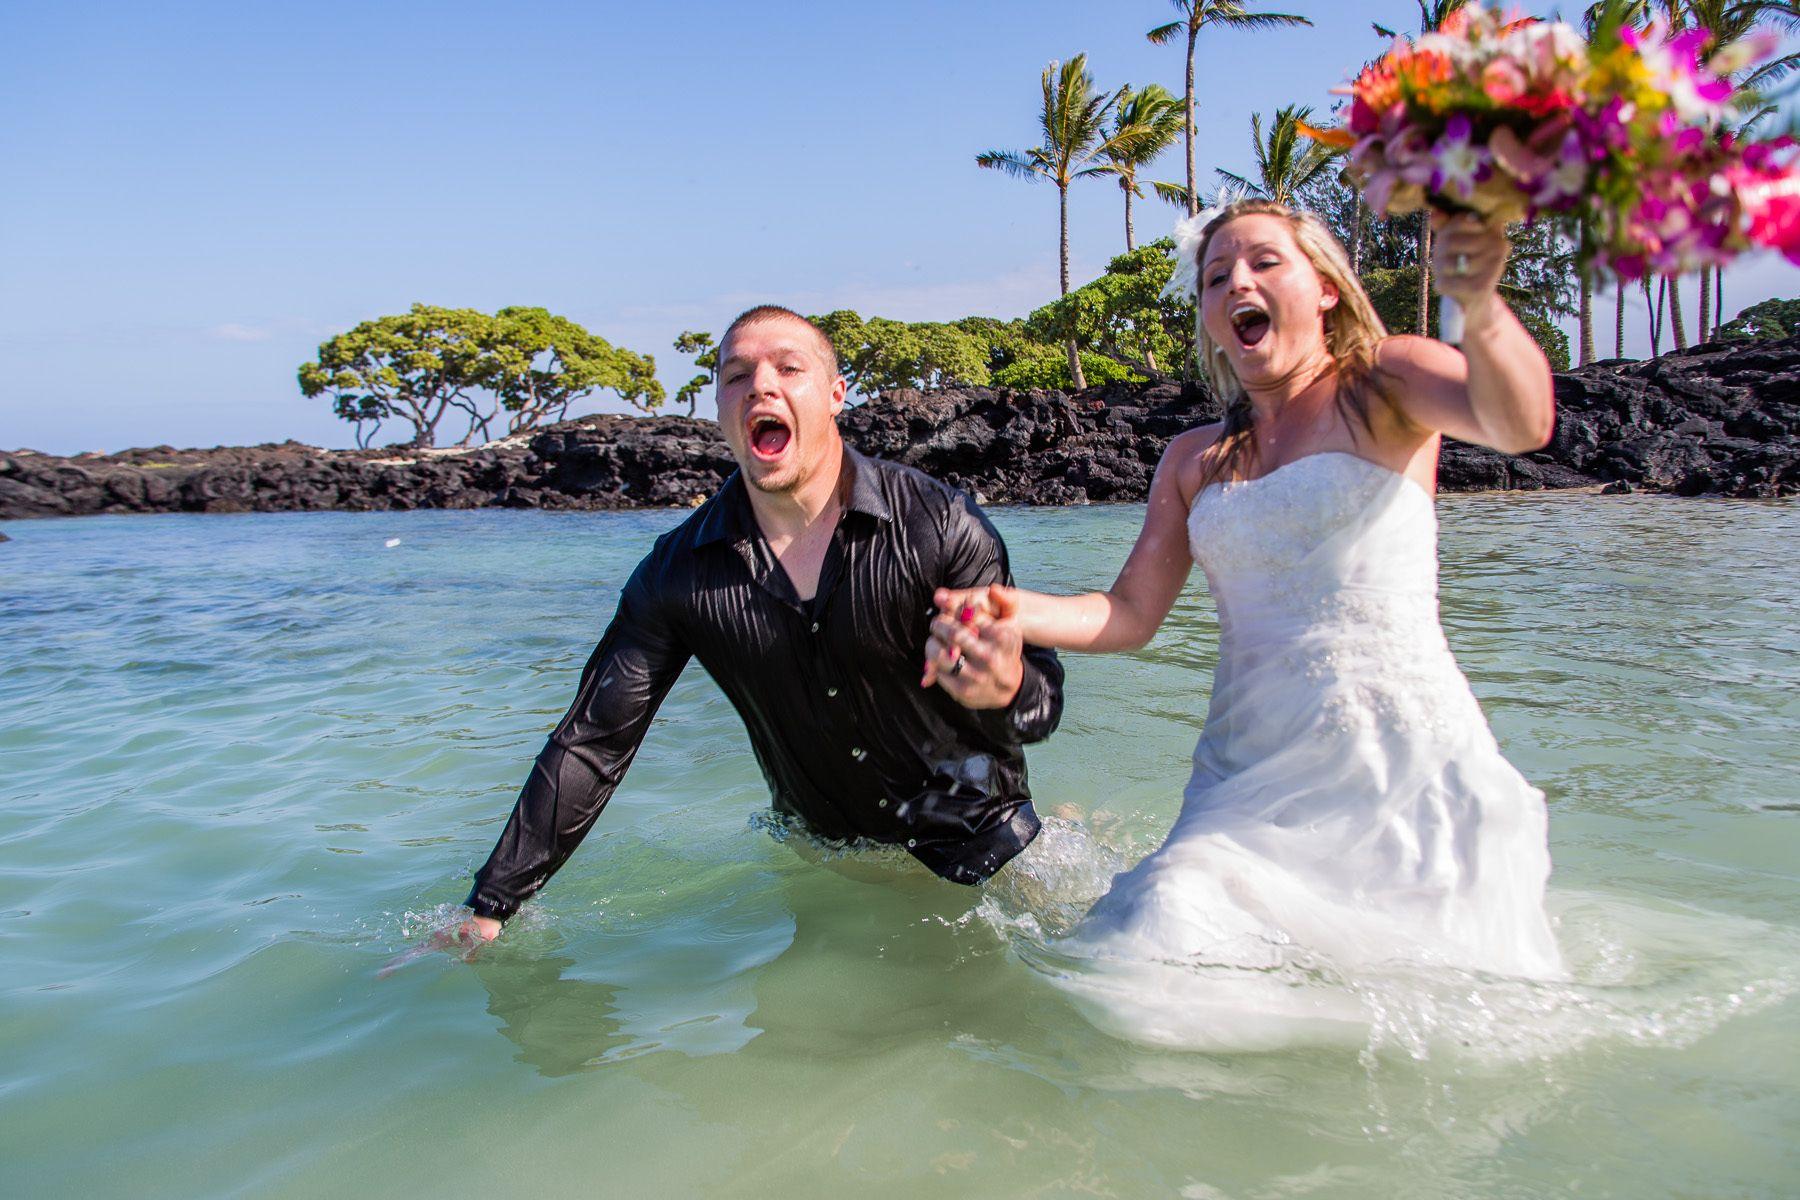 1kailua_kona__honolulu__hawaii__wedding__photographer_1456